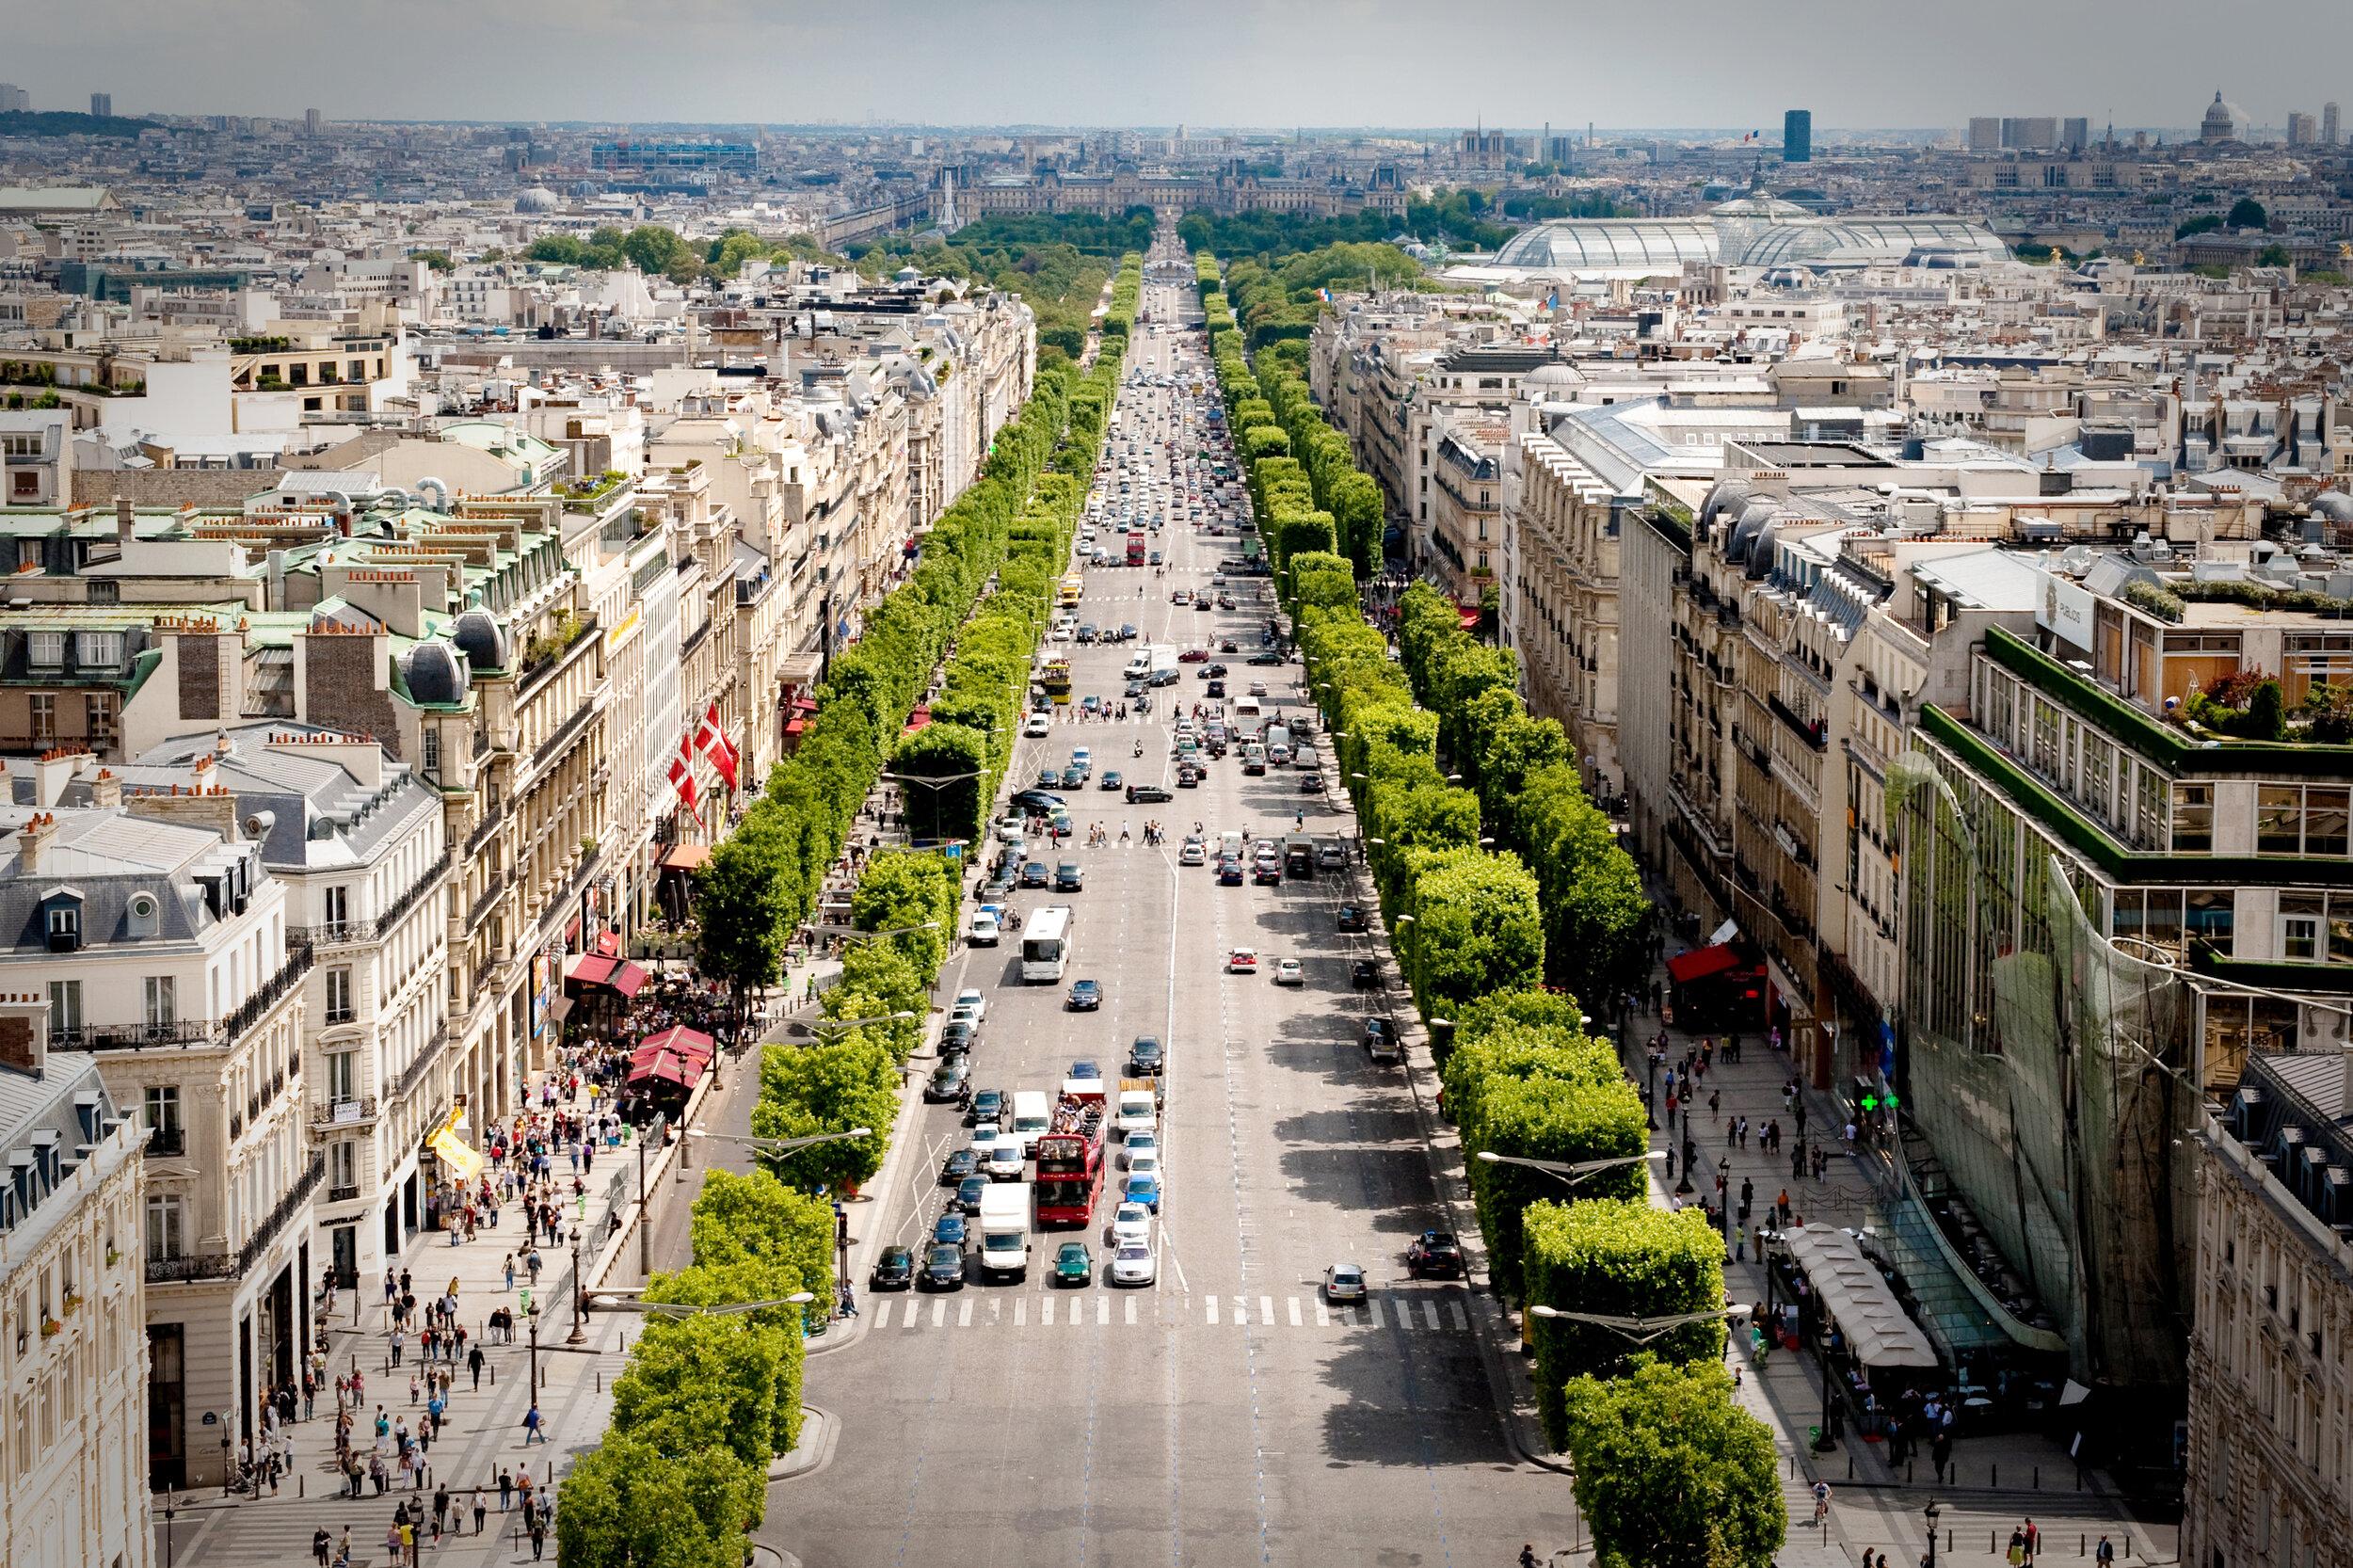 3- Champs-Élysées -